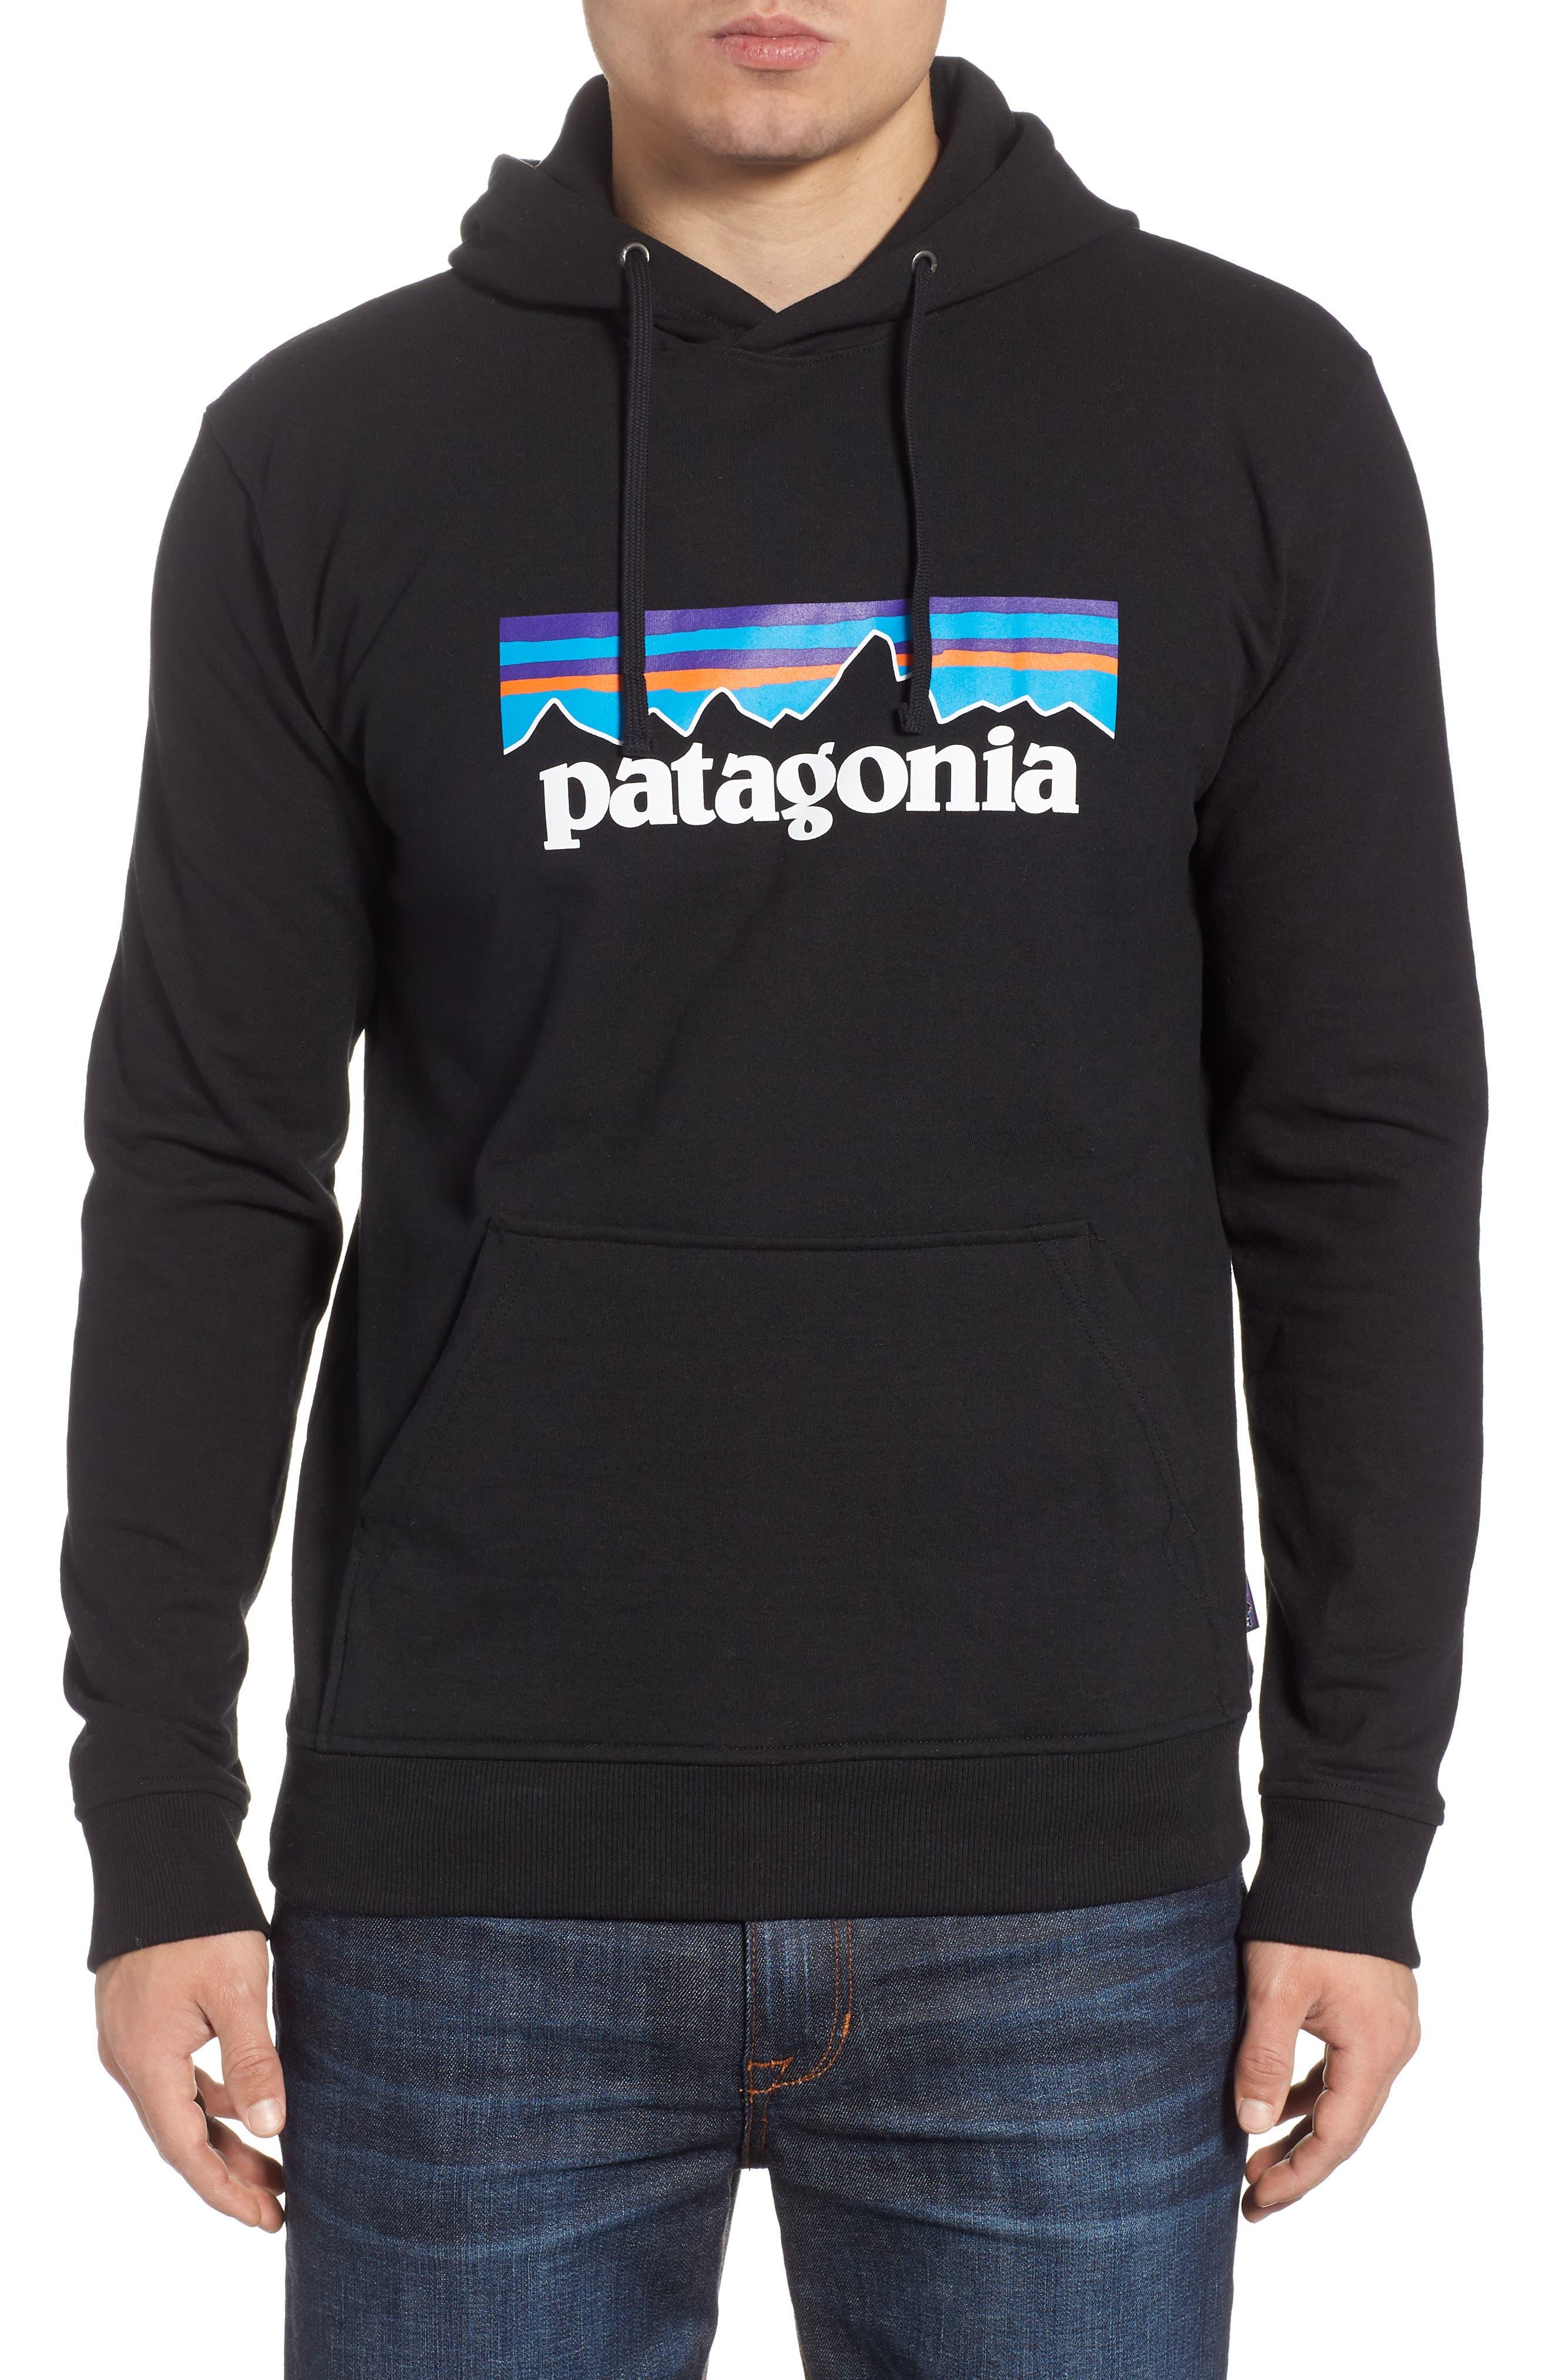 256df3536f7f Sweatshirts   Hoodies Patagonia Jackets